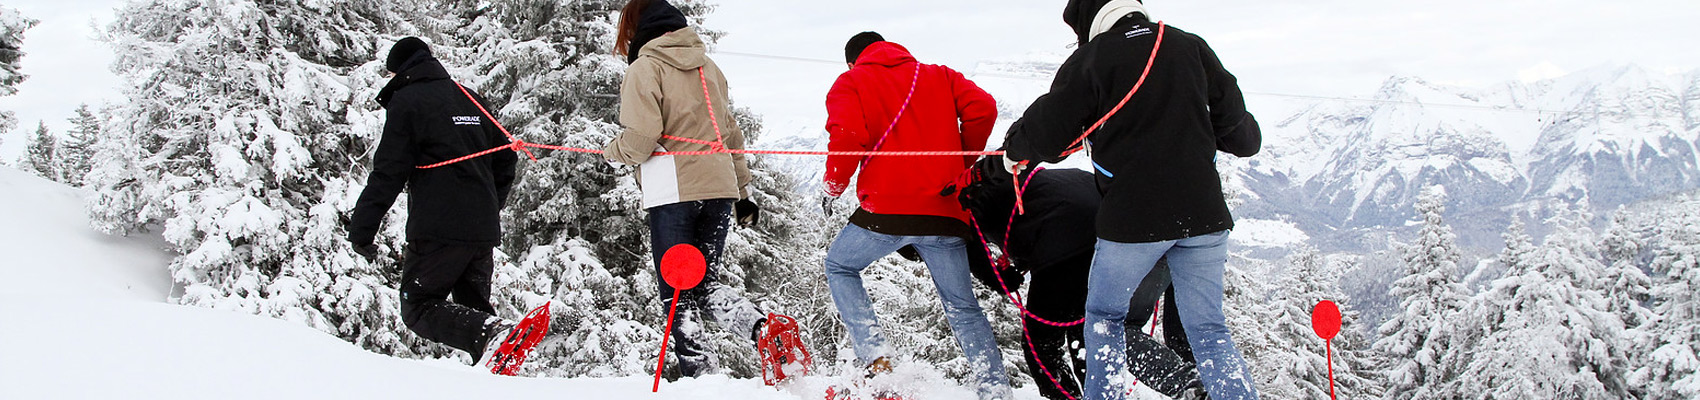 Sortie raquettes à neige à Superbesse - Evolution 2